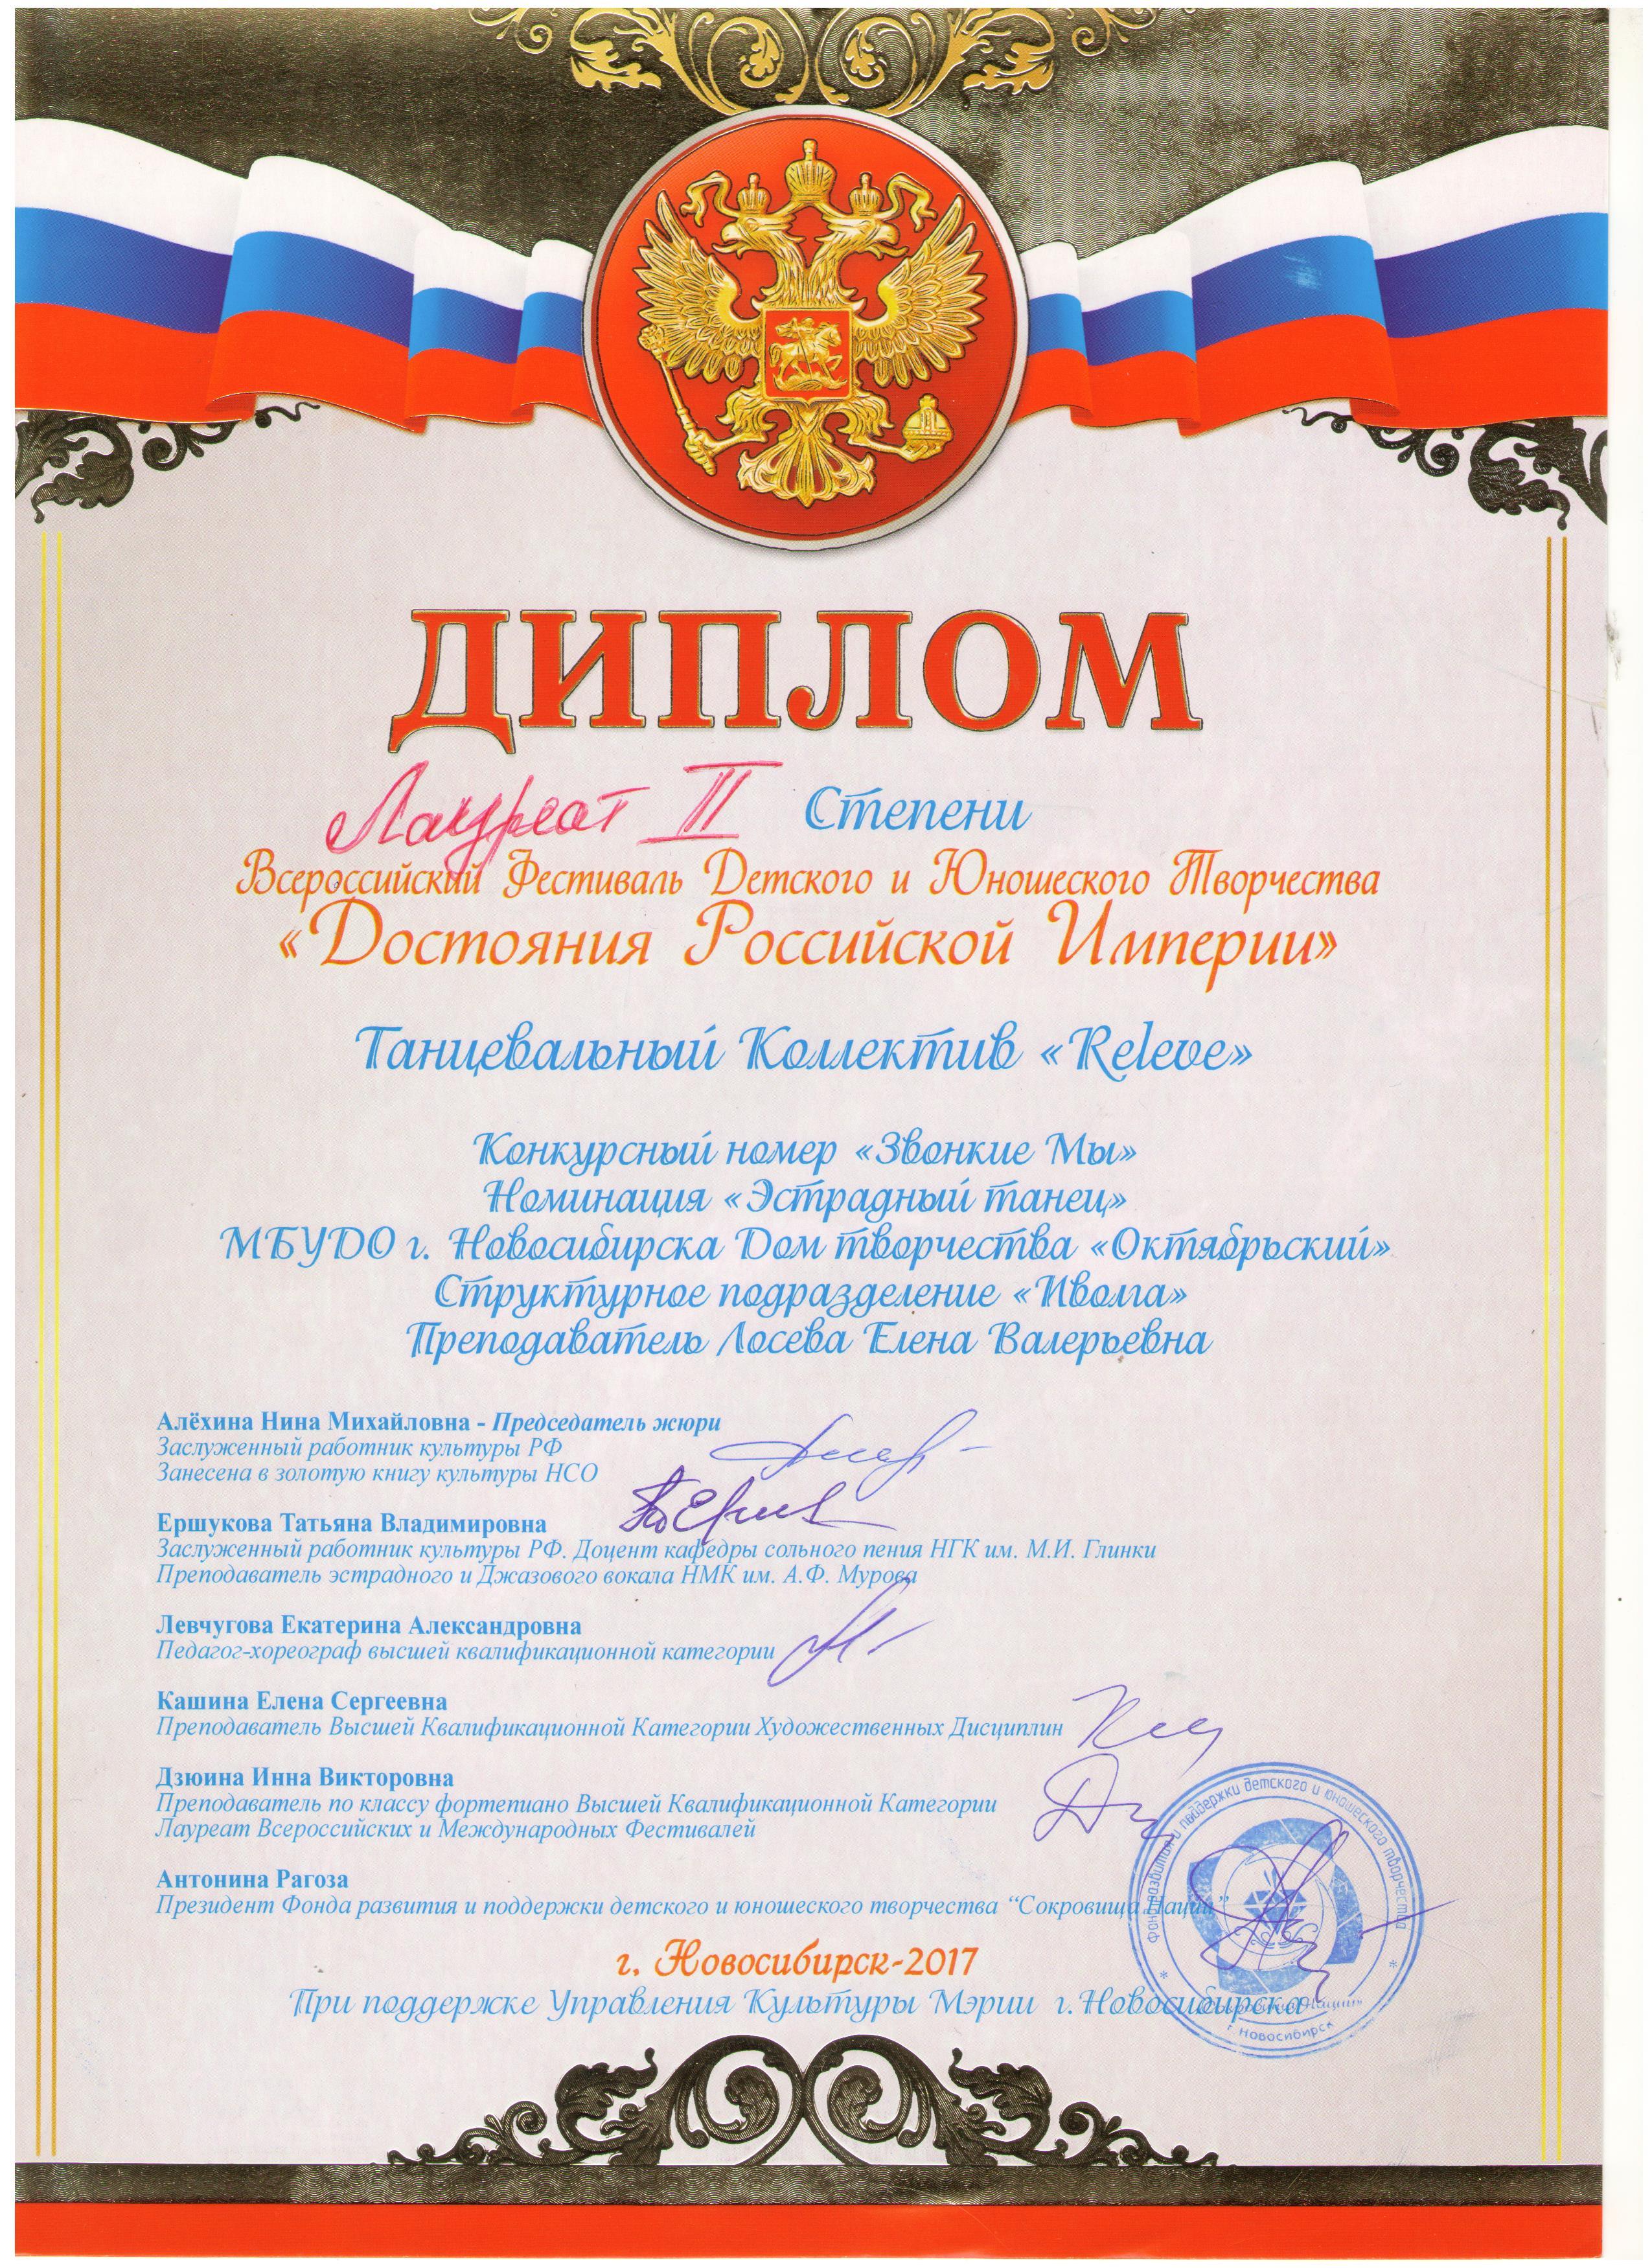 Laureat-2-stepeni_Dostoyanie-Imperii_26.02.17-001